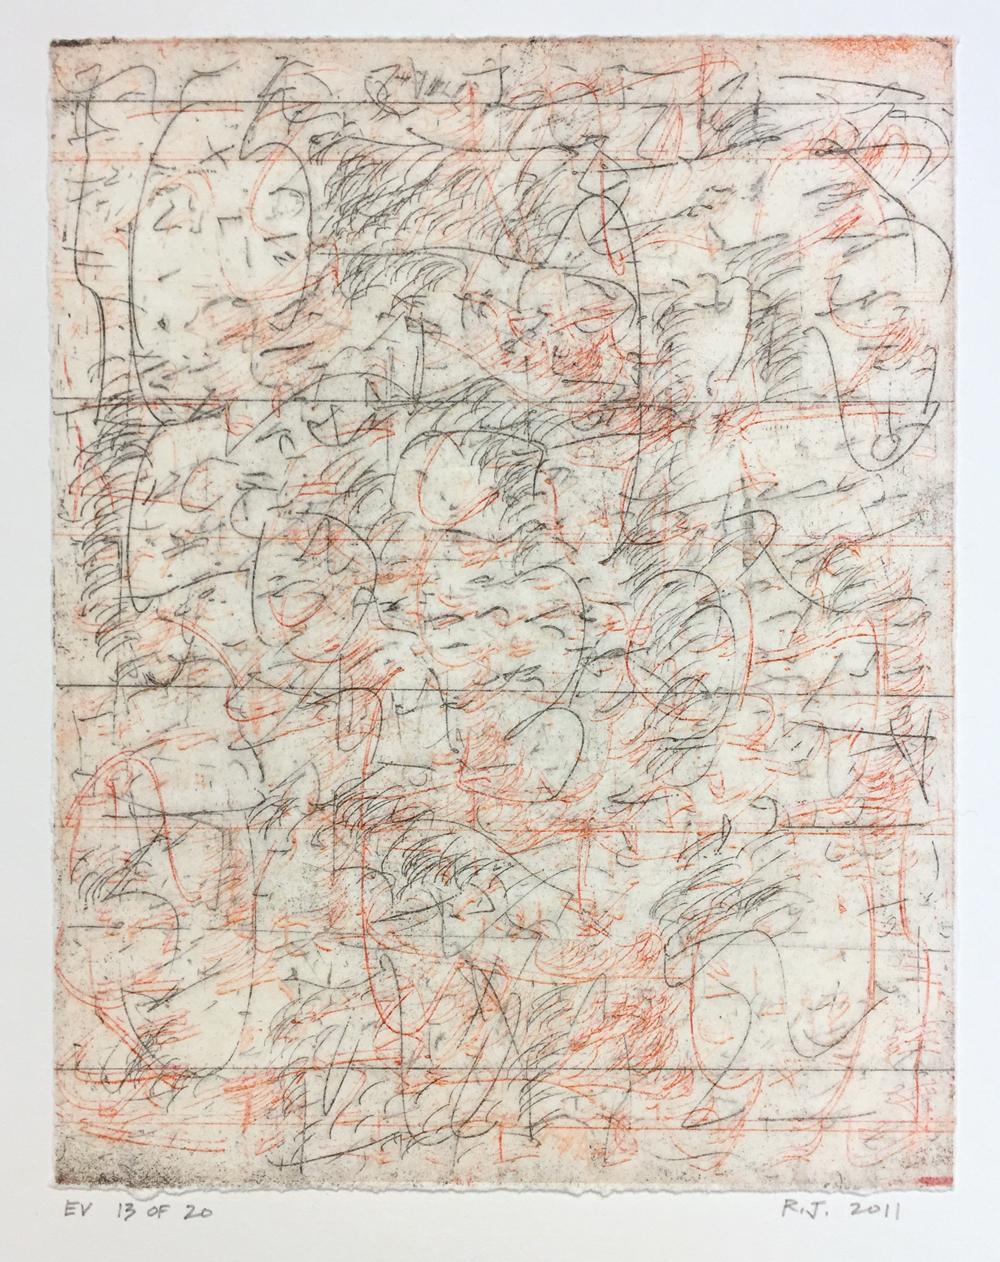 Robert C. Jones, EV, 2011, edition 13/20, etching, 10 x 7.75 inches, $600.